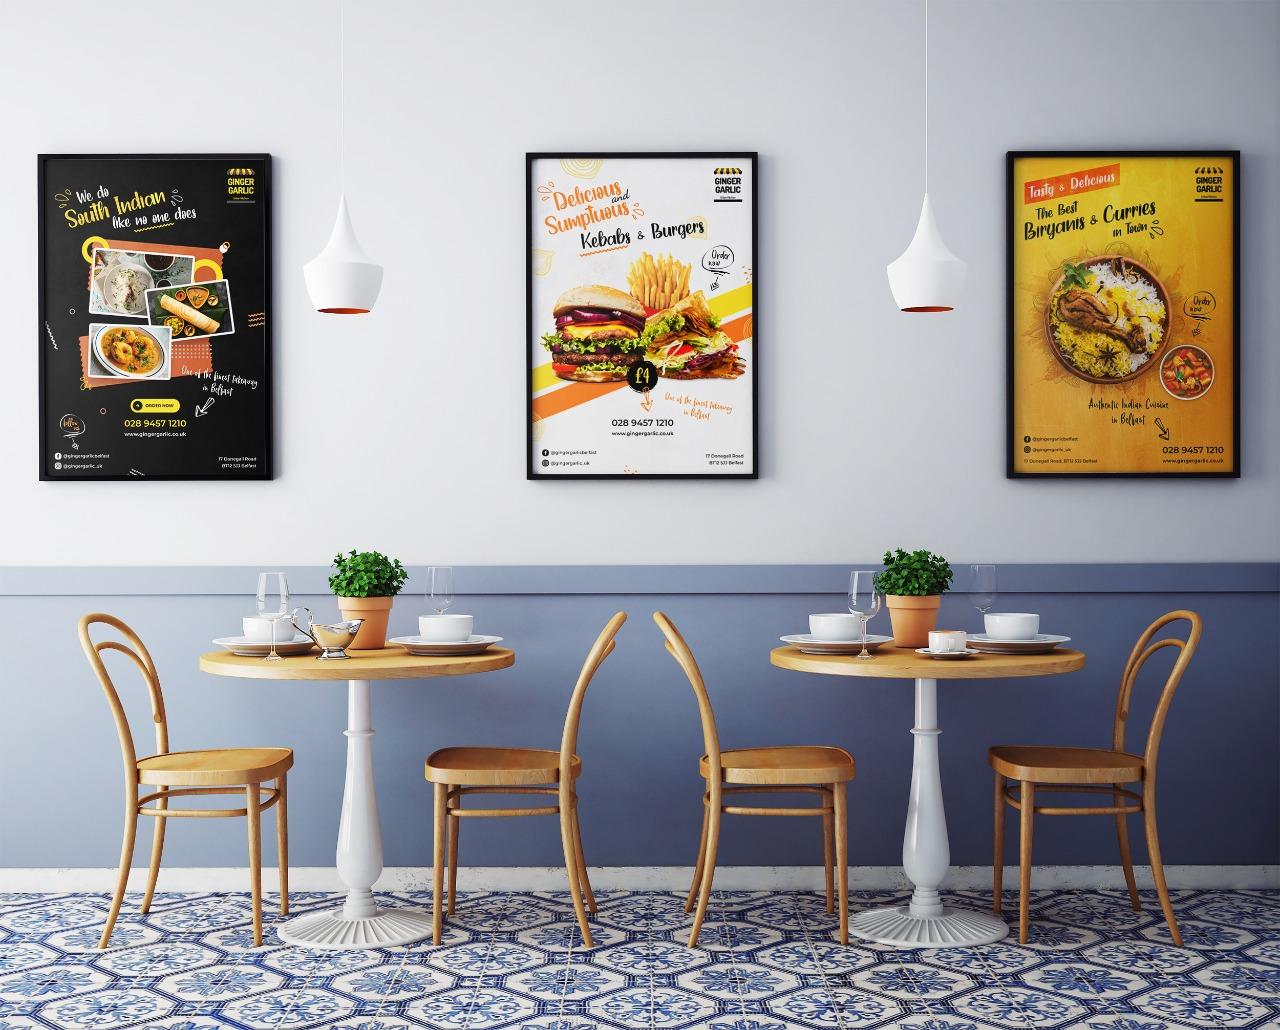 Restaurant Posters Design Services